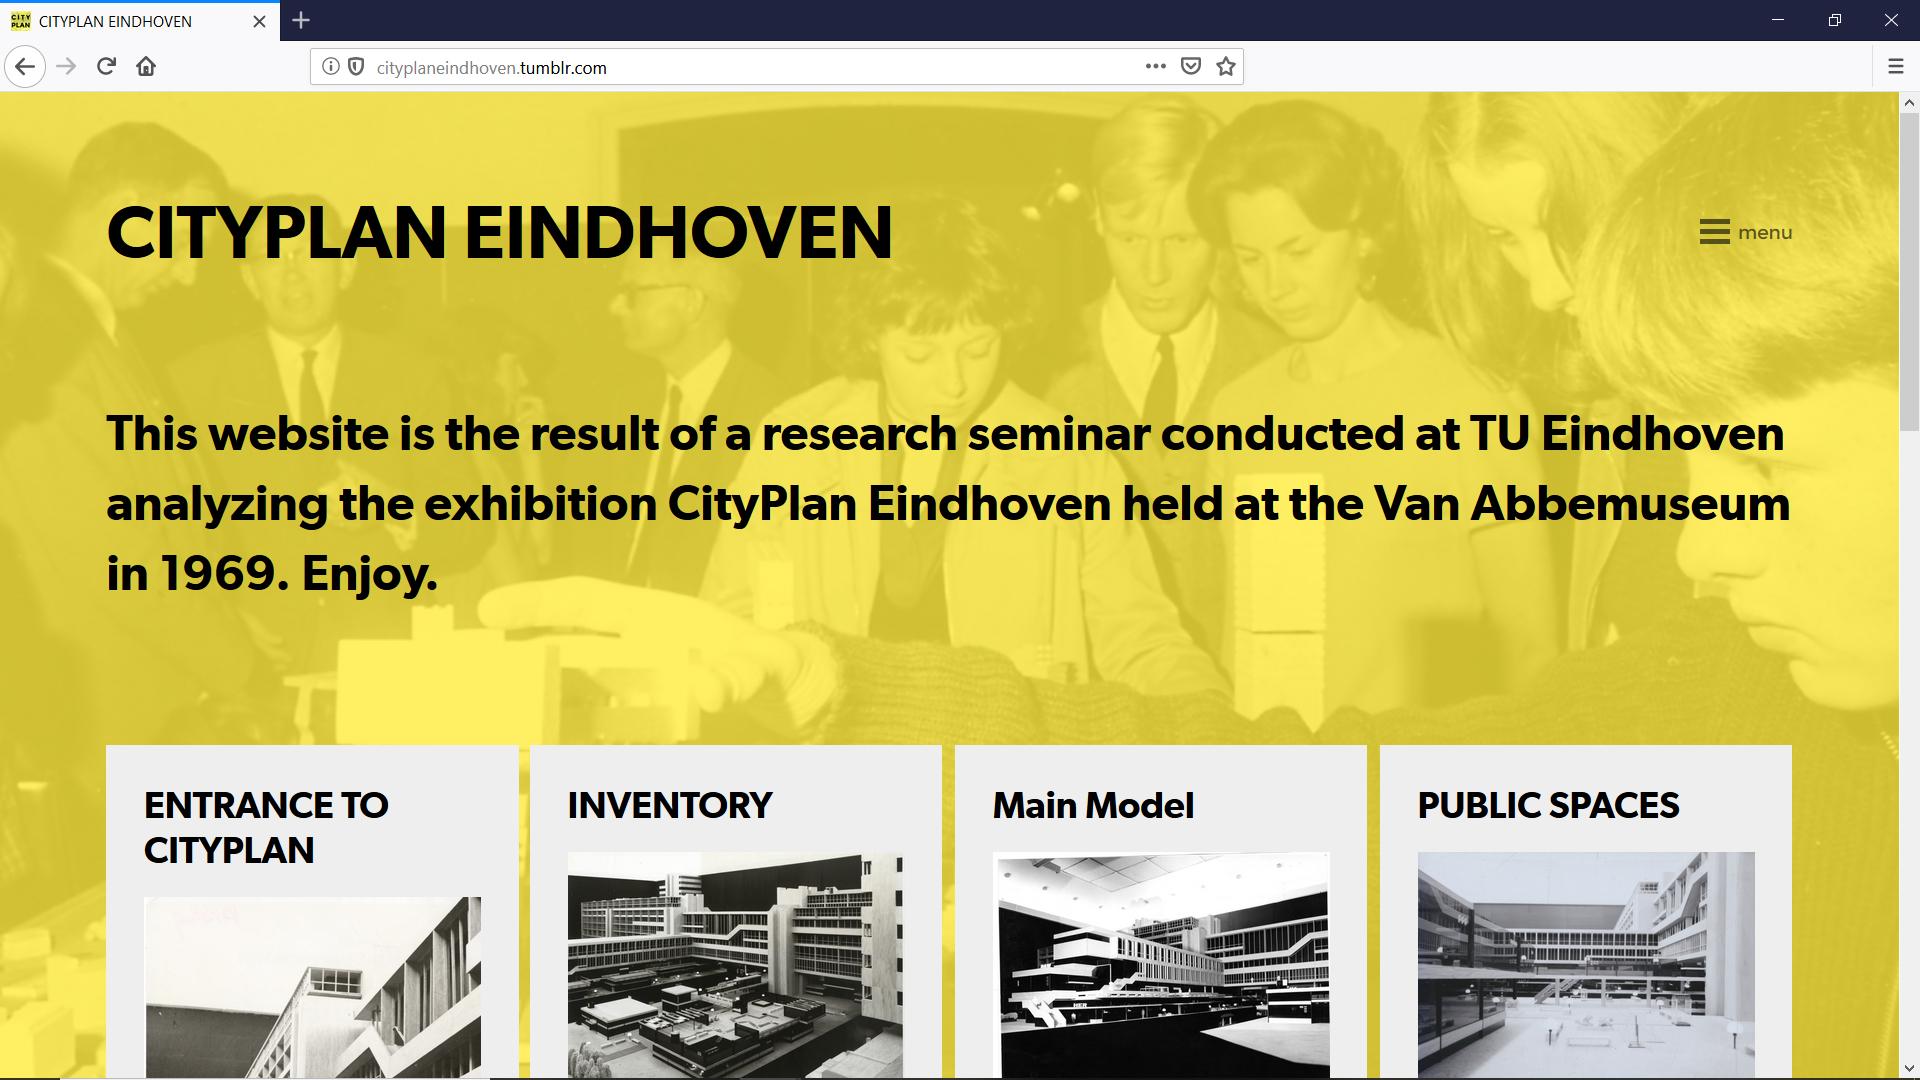 Revisiting CityPlan Eindhoven - DIGITAL ESSAYs